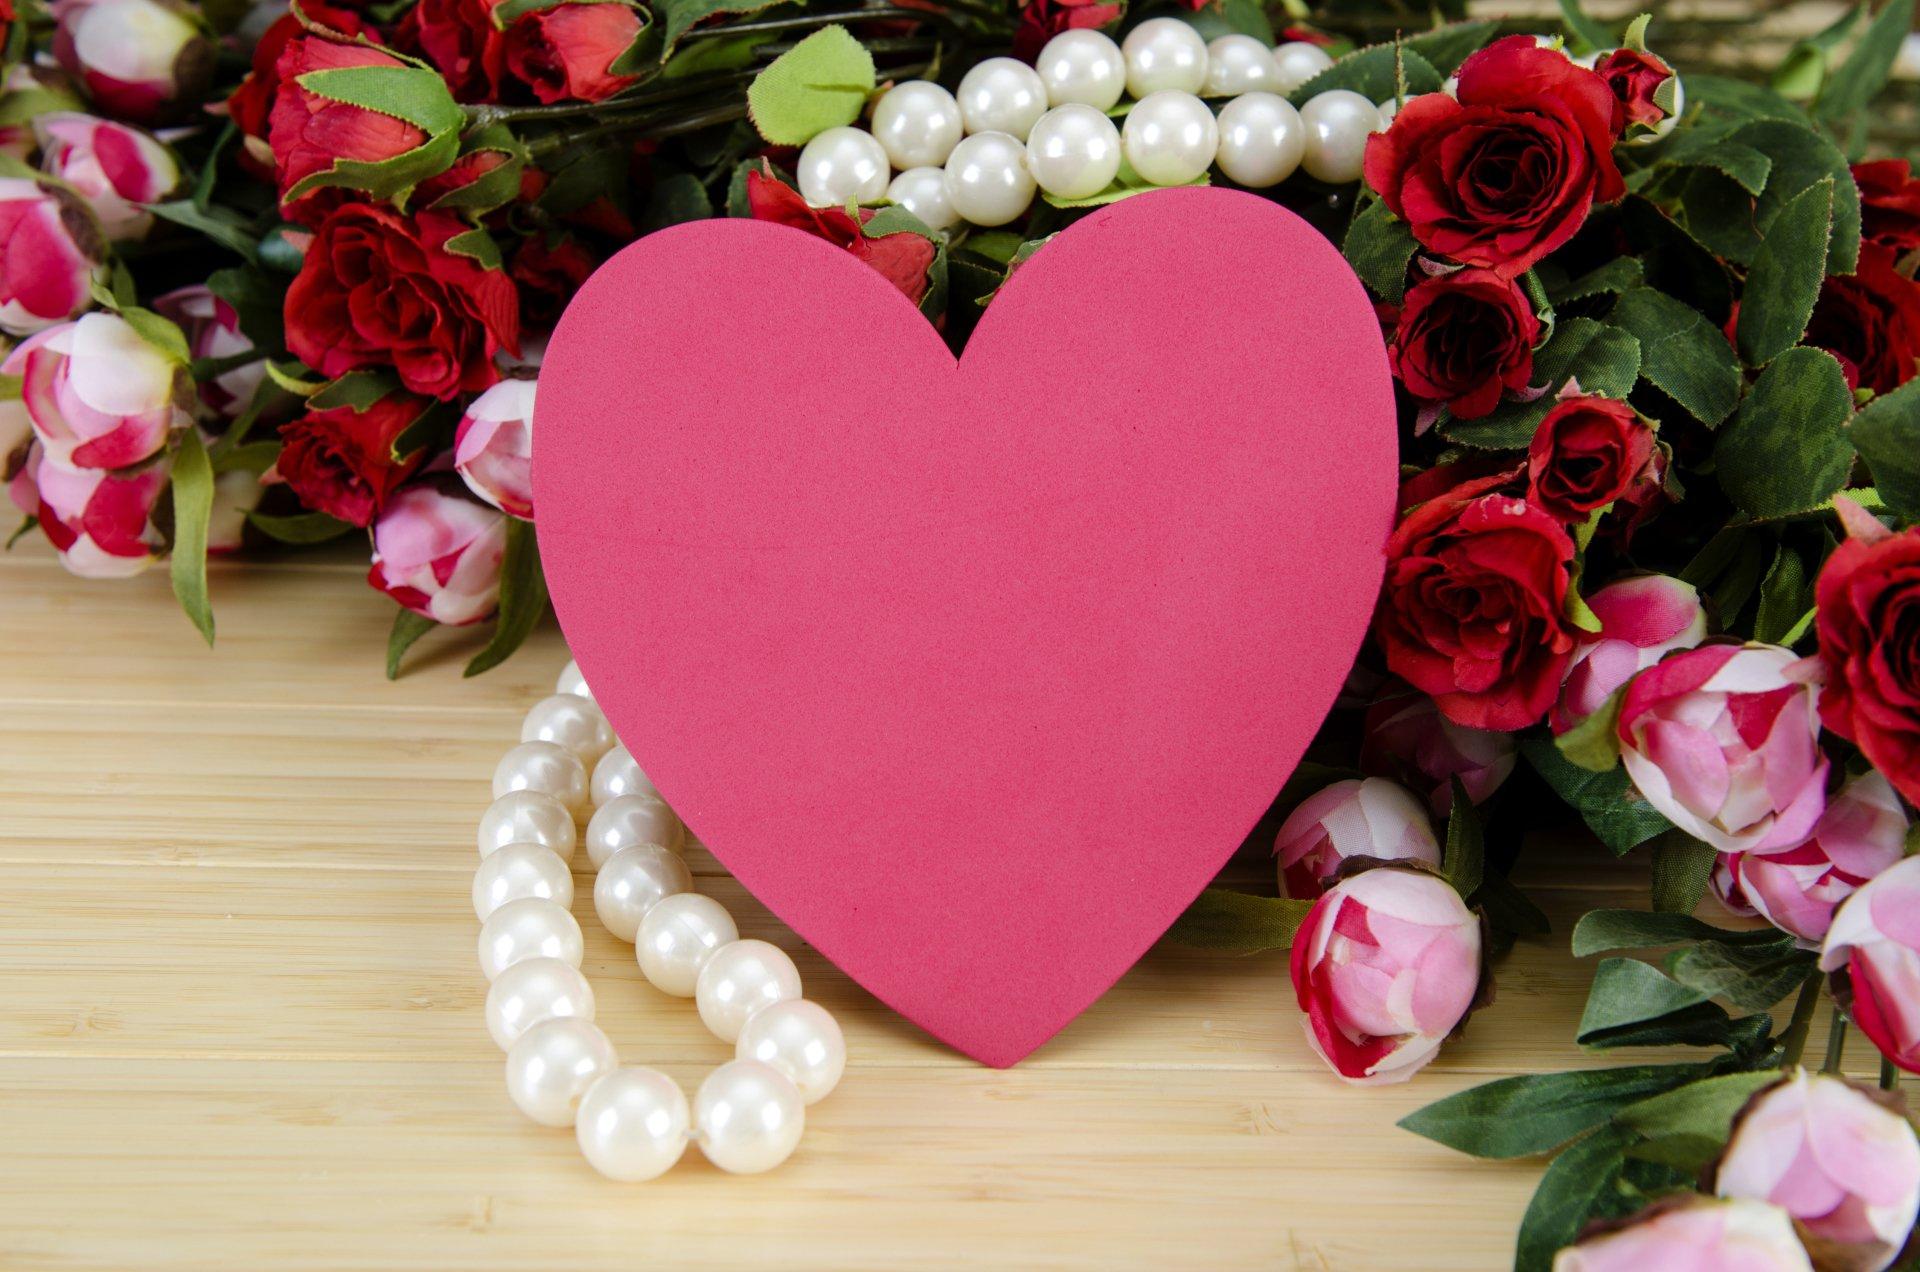 Wakacje - Walentynki  Wakacje Kwiat Pearl Serce Pink Tapeta